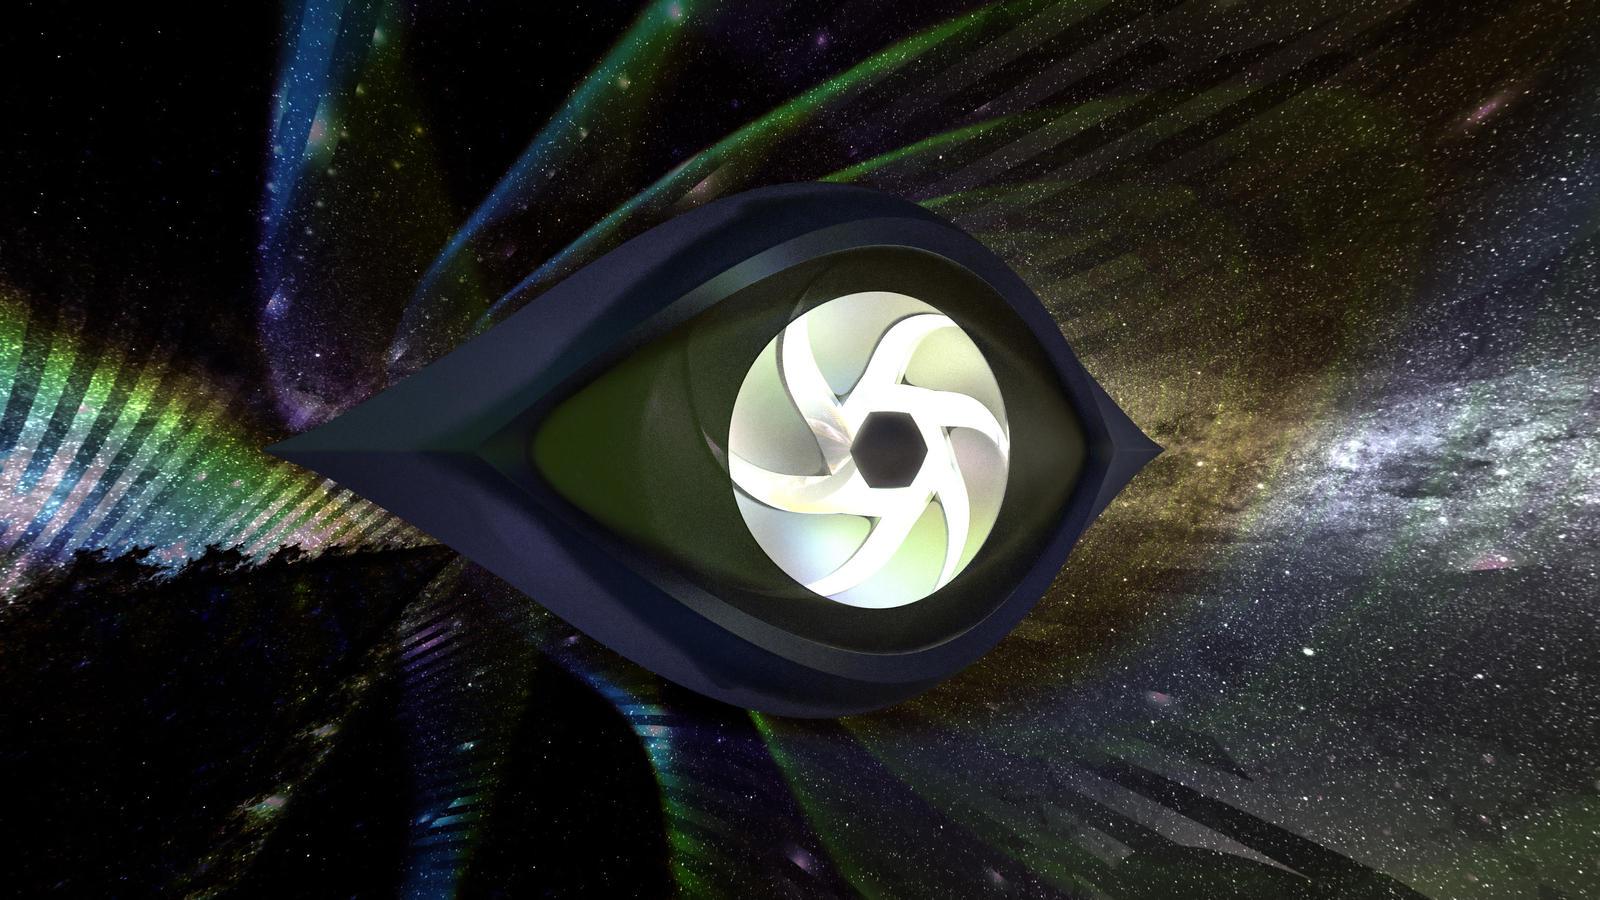 Eye of Argus